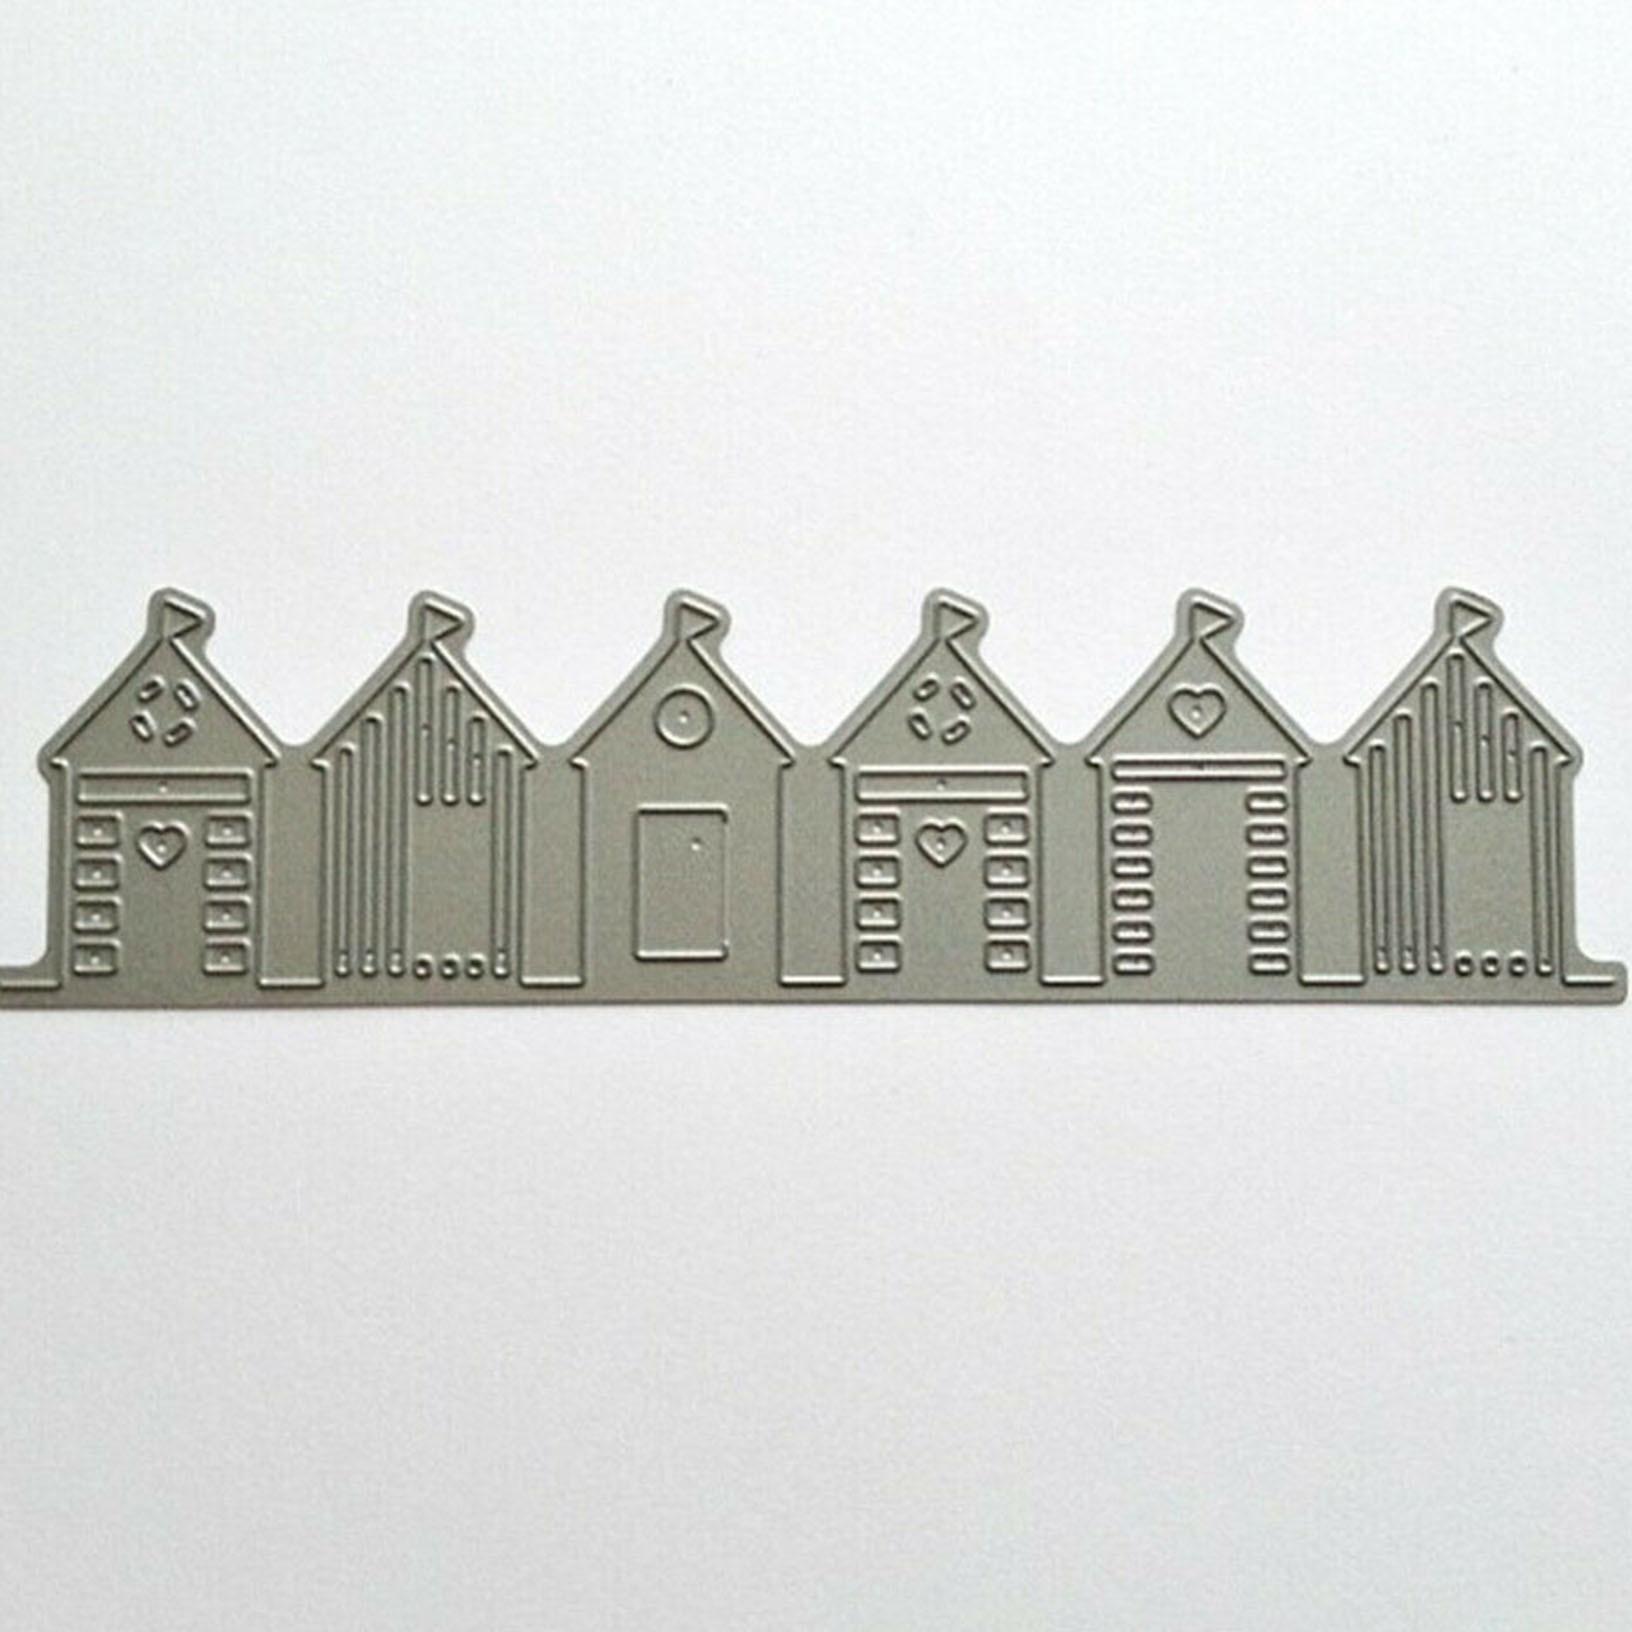 DIY Beach Houses Edge Building Stencil Cutting Scrapbooking Die Cutting Template